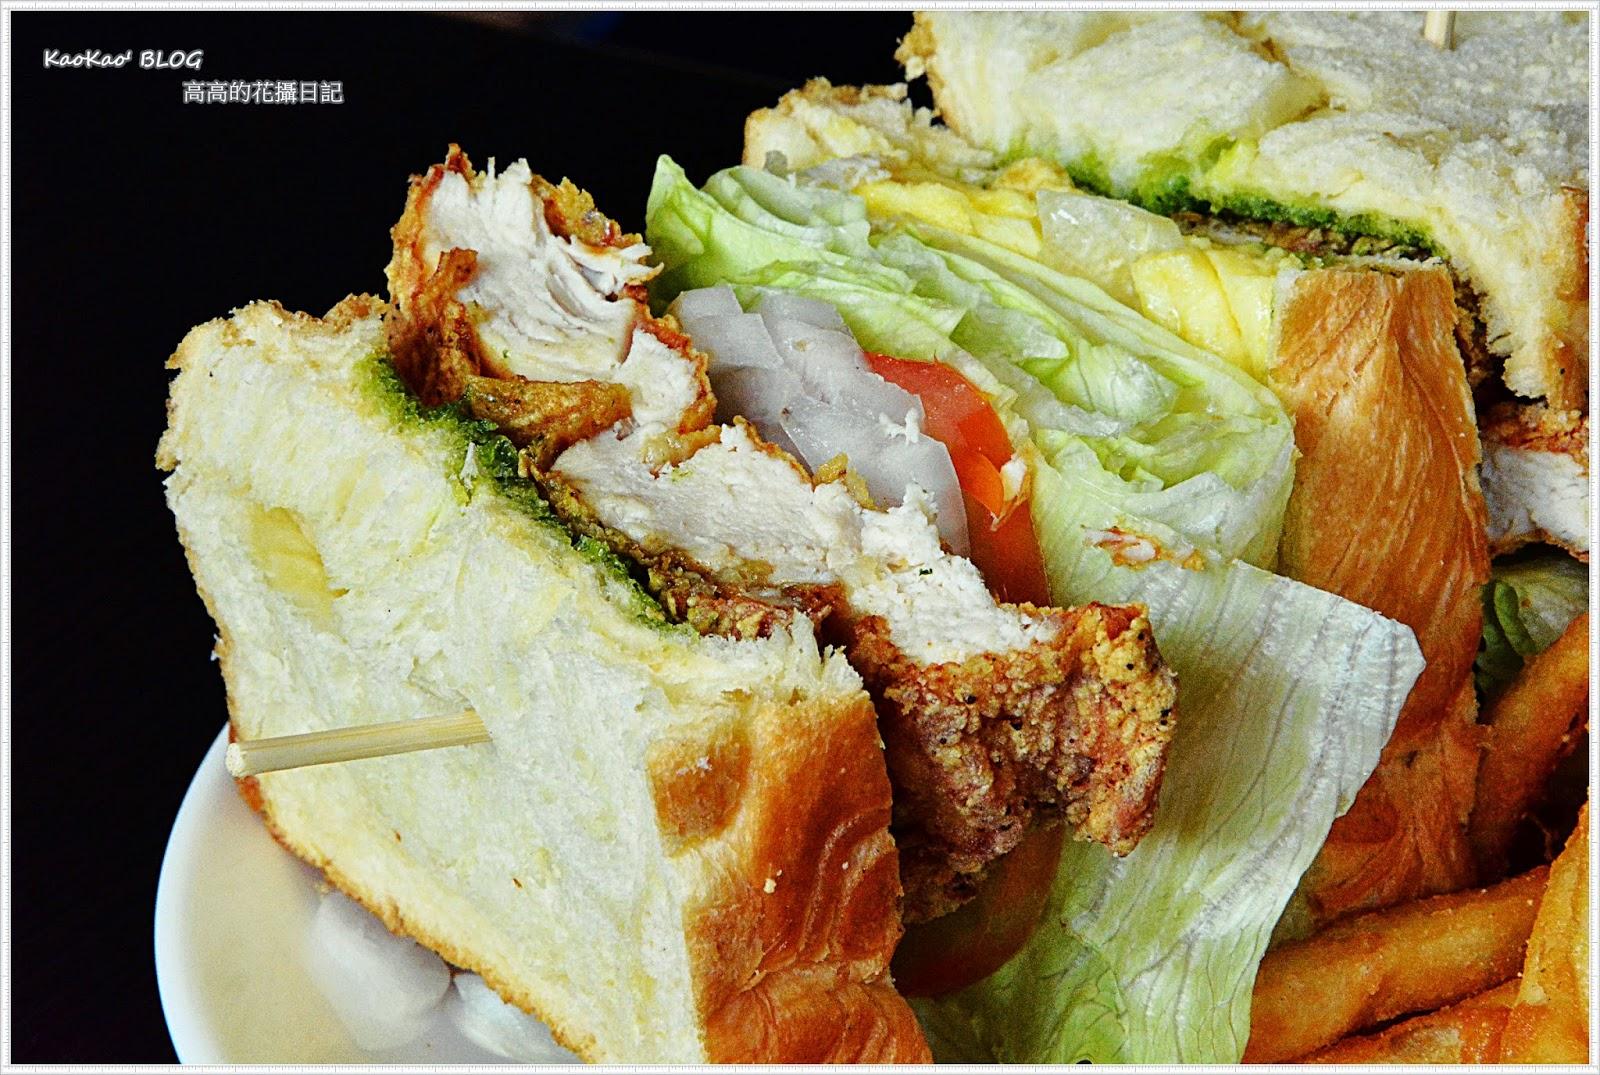 【高雄】Cozy Diner 可里小餐館 - 高高 - nidBox 親子盒子